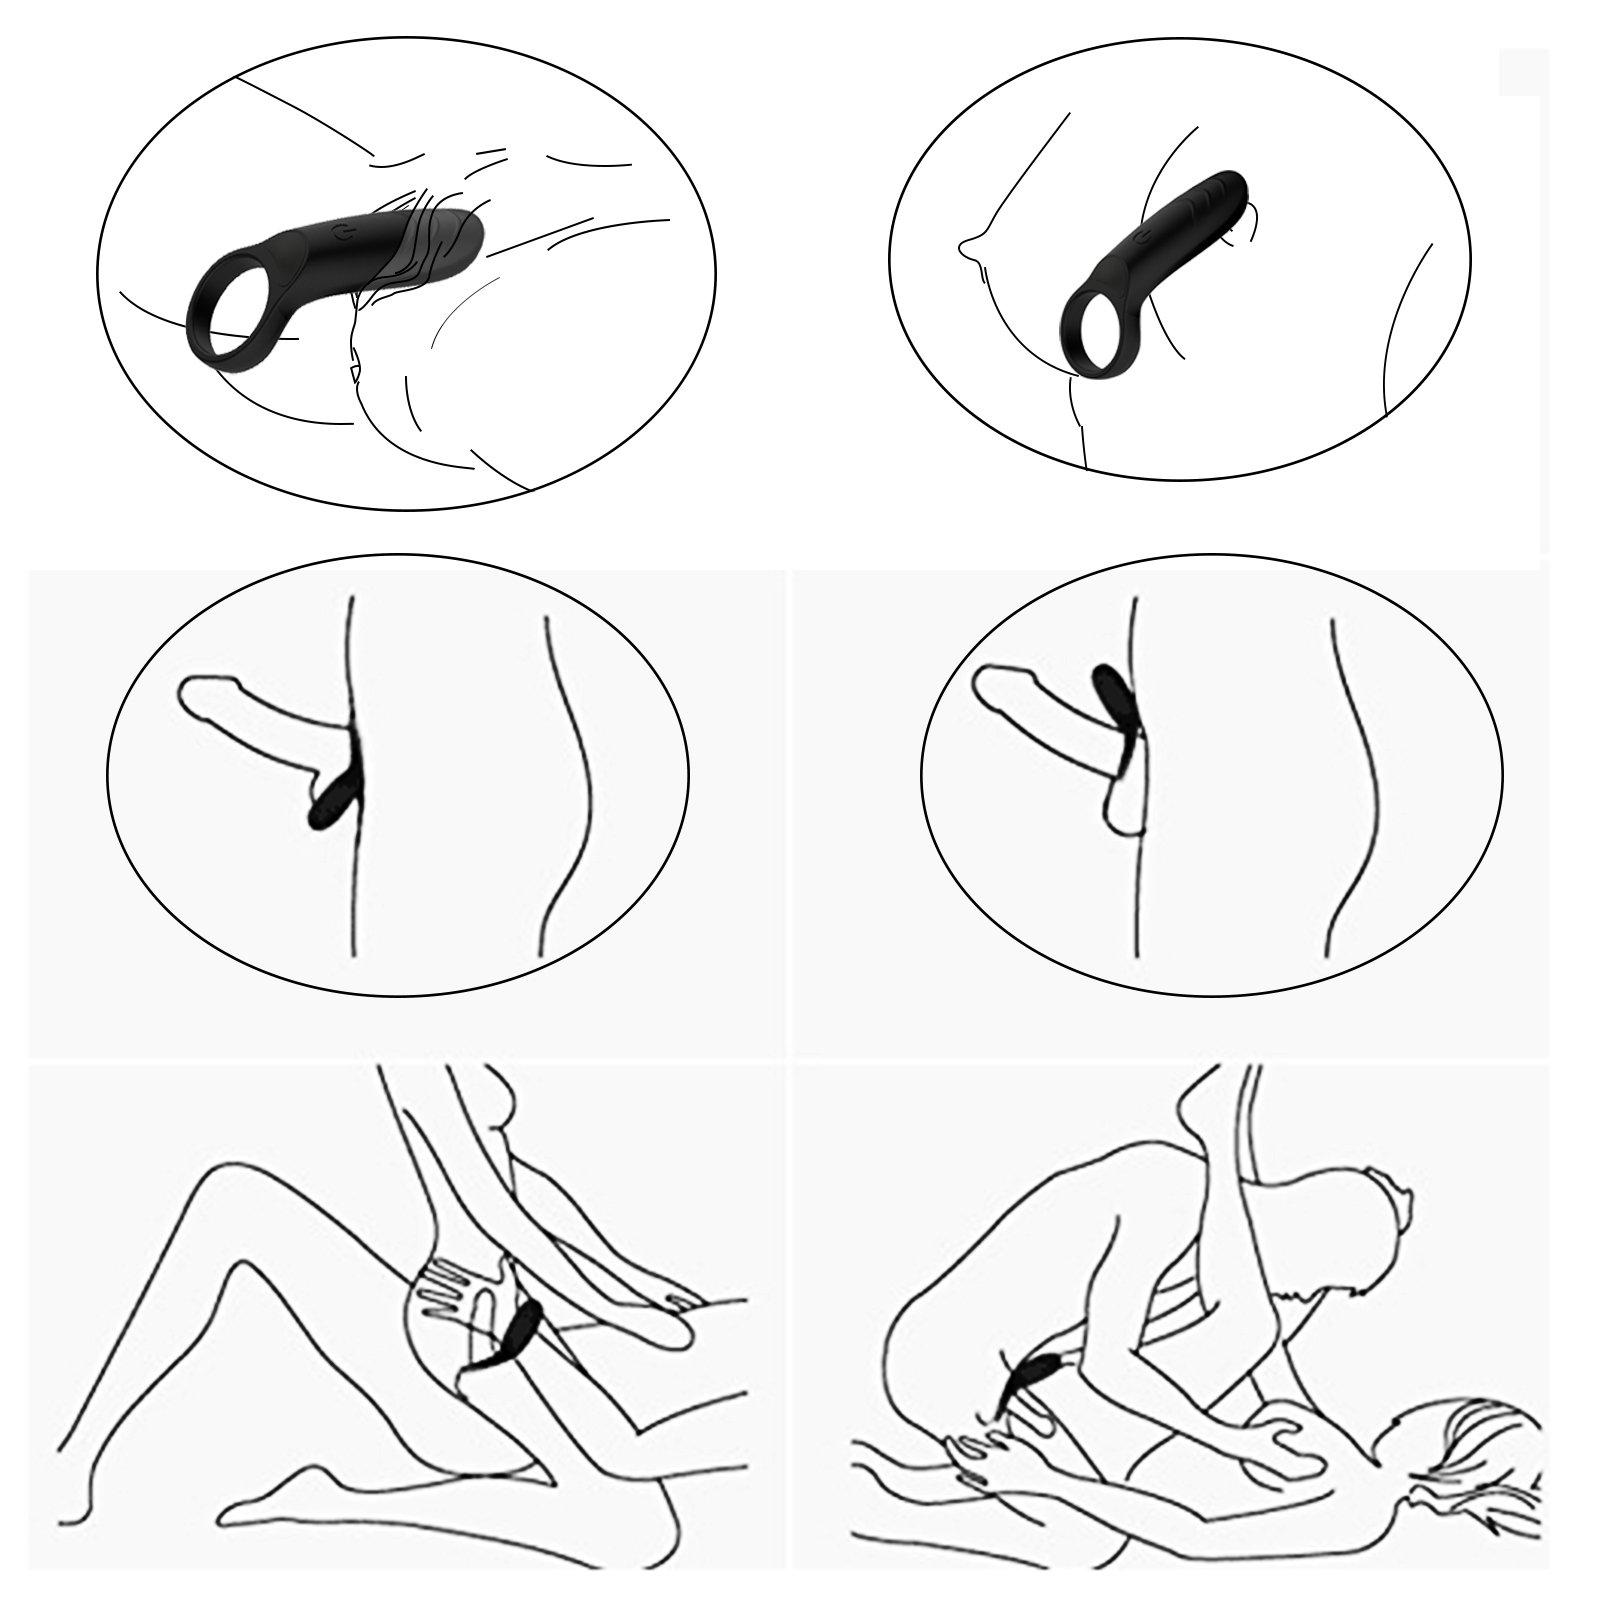 Cockring Vibrator Vibrierend mit Klitorisstimulator Silikon Penisring 10-Vibration Sexspielzeug für Männer, Ø 33 mm (Schwarz)